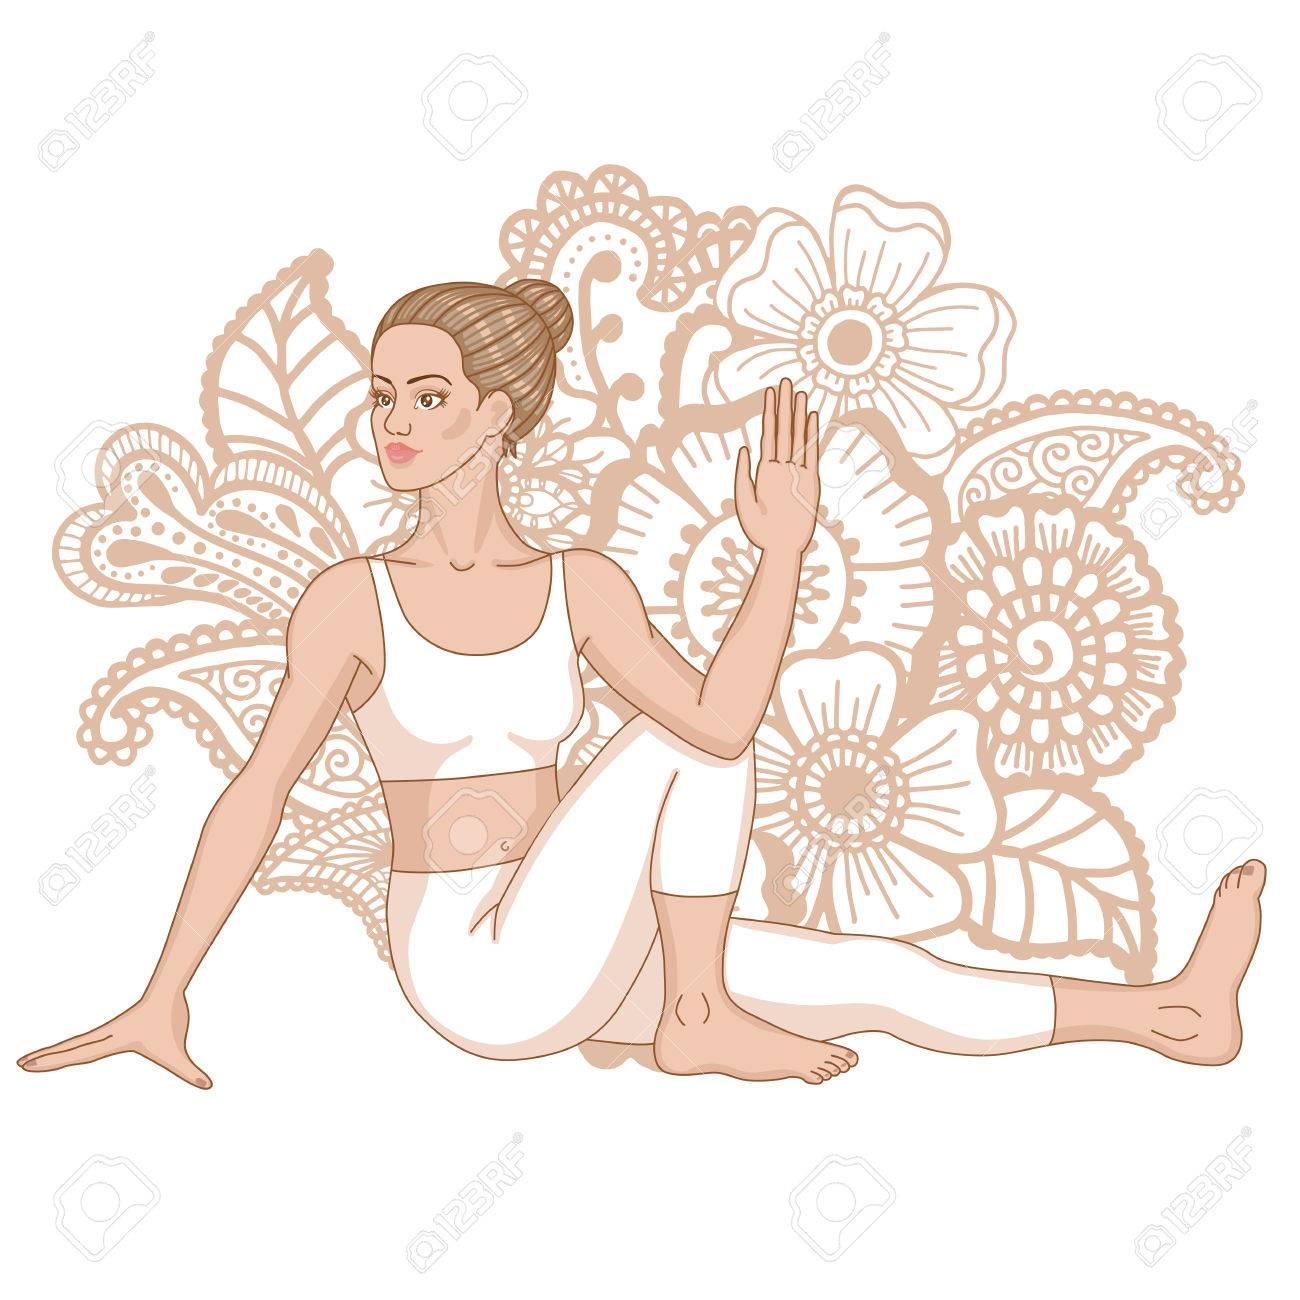 Women Silhouette Marichis Yoga Pose Marichyasana Royalty Free Cliparts Vectors And Stock Illustration Image 76764640